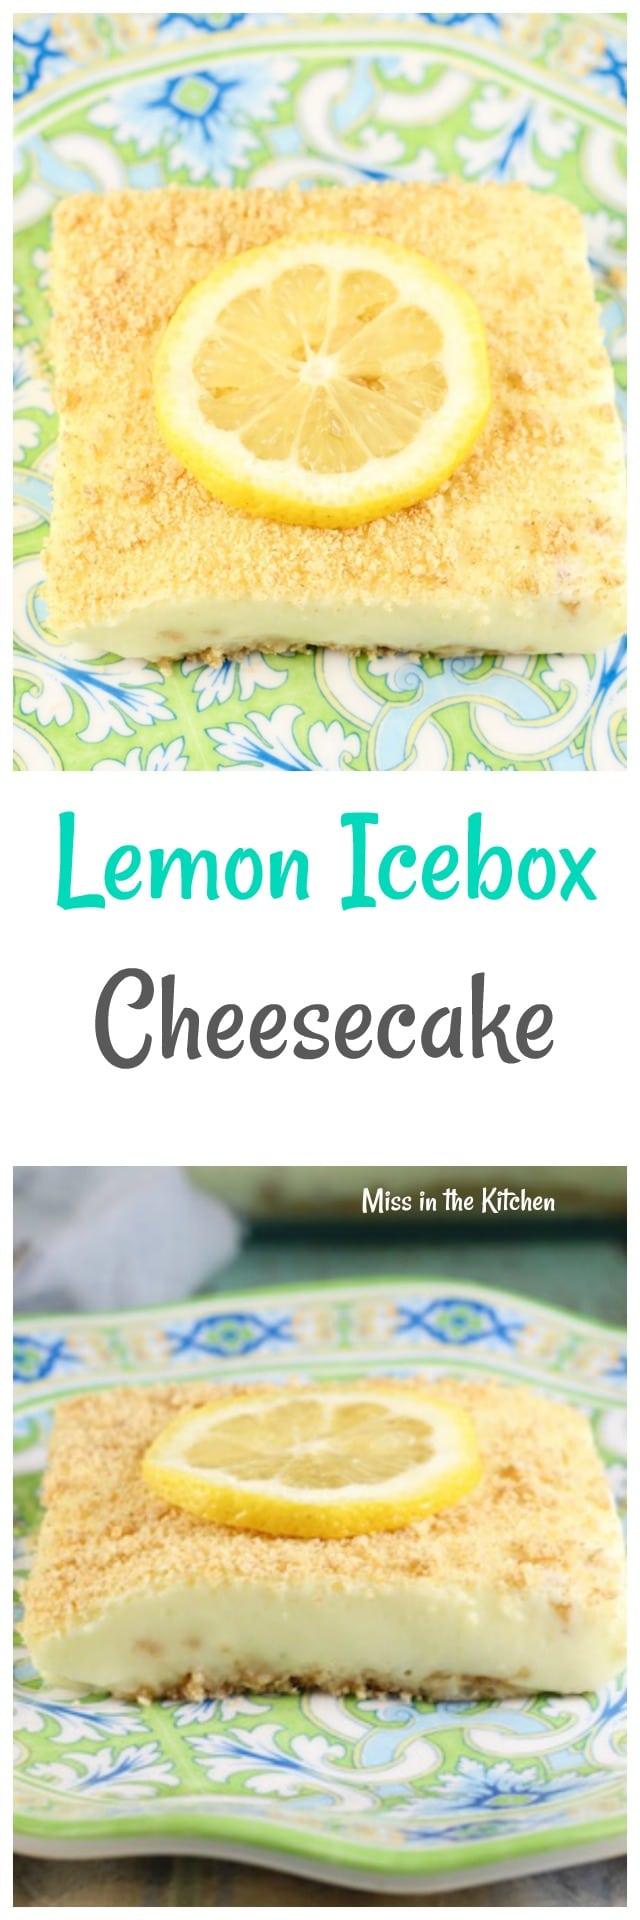 Lemon Icebox Cheesecake Recipe ~ Easy No Bake Dessert ~ MissintheKitchen.com